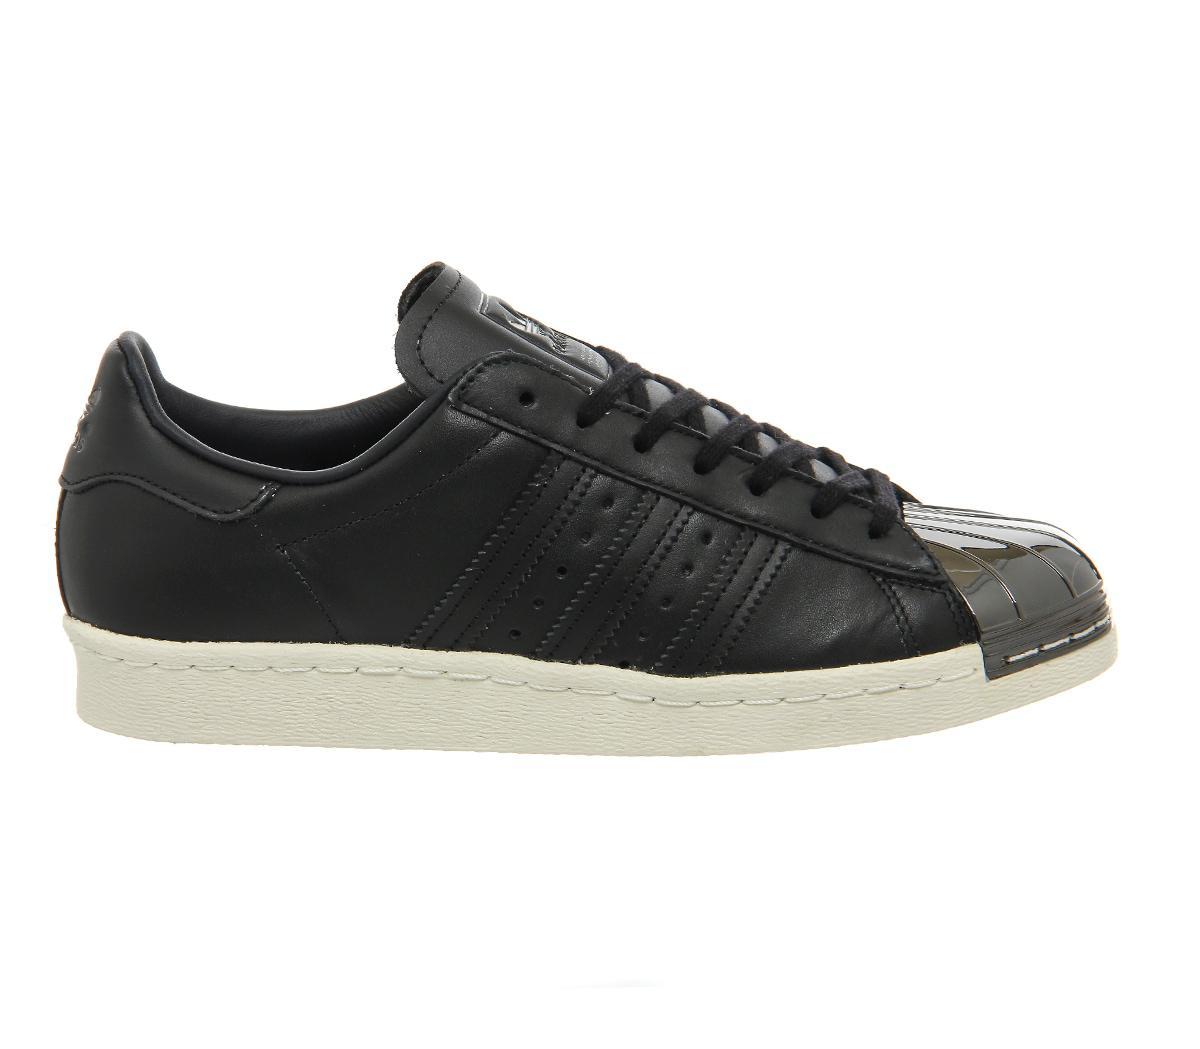 adidas black superstar 80s metal toe trainers